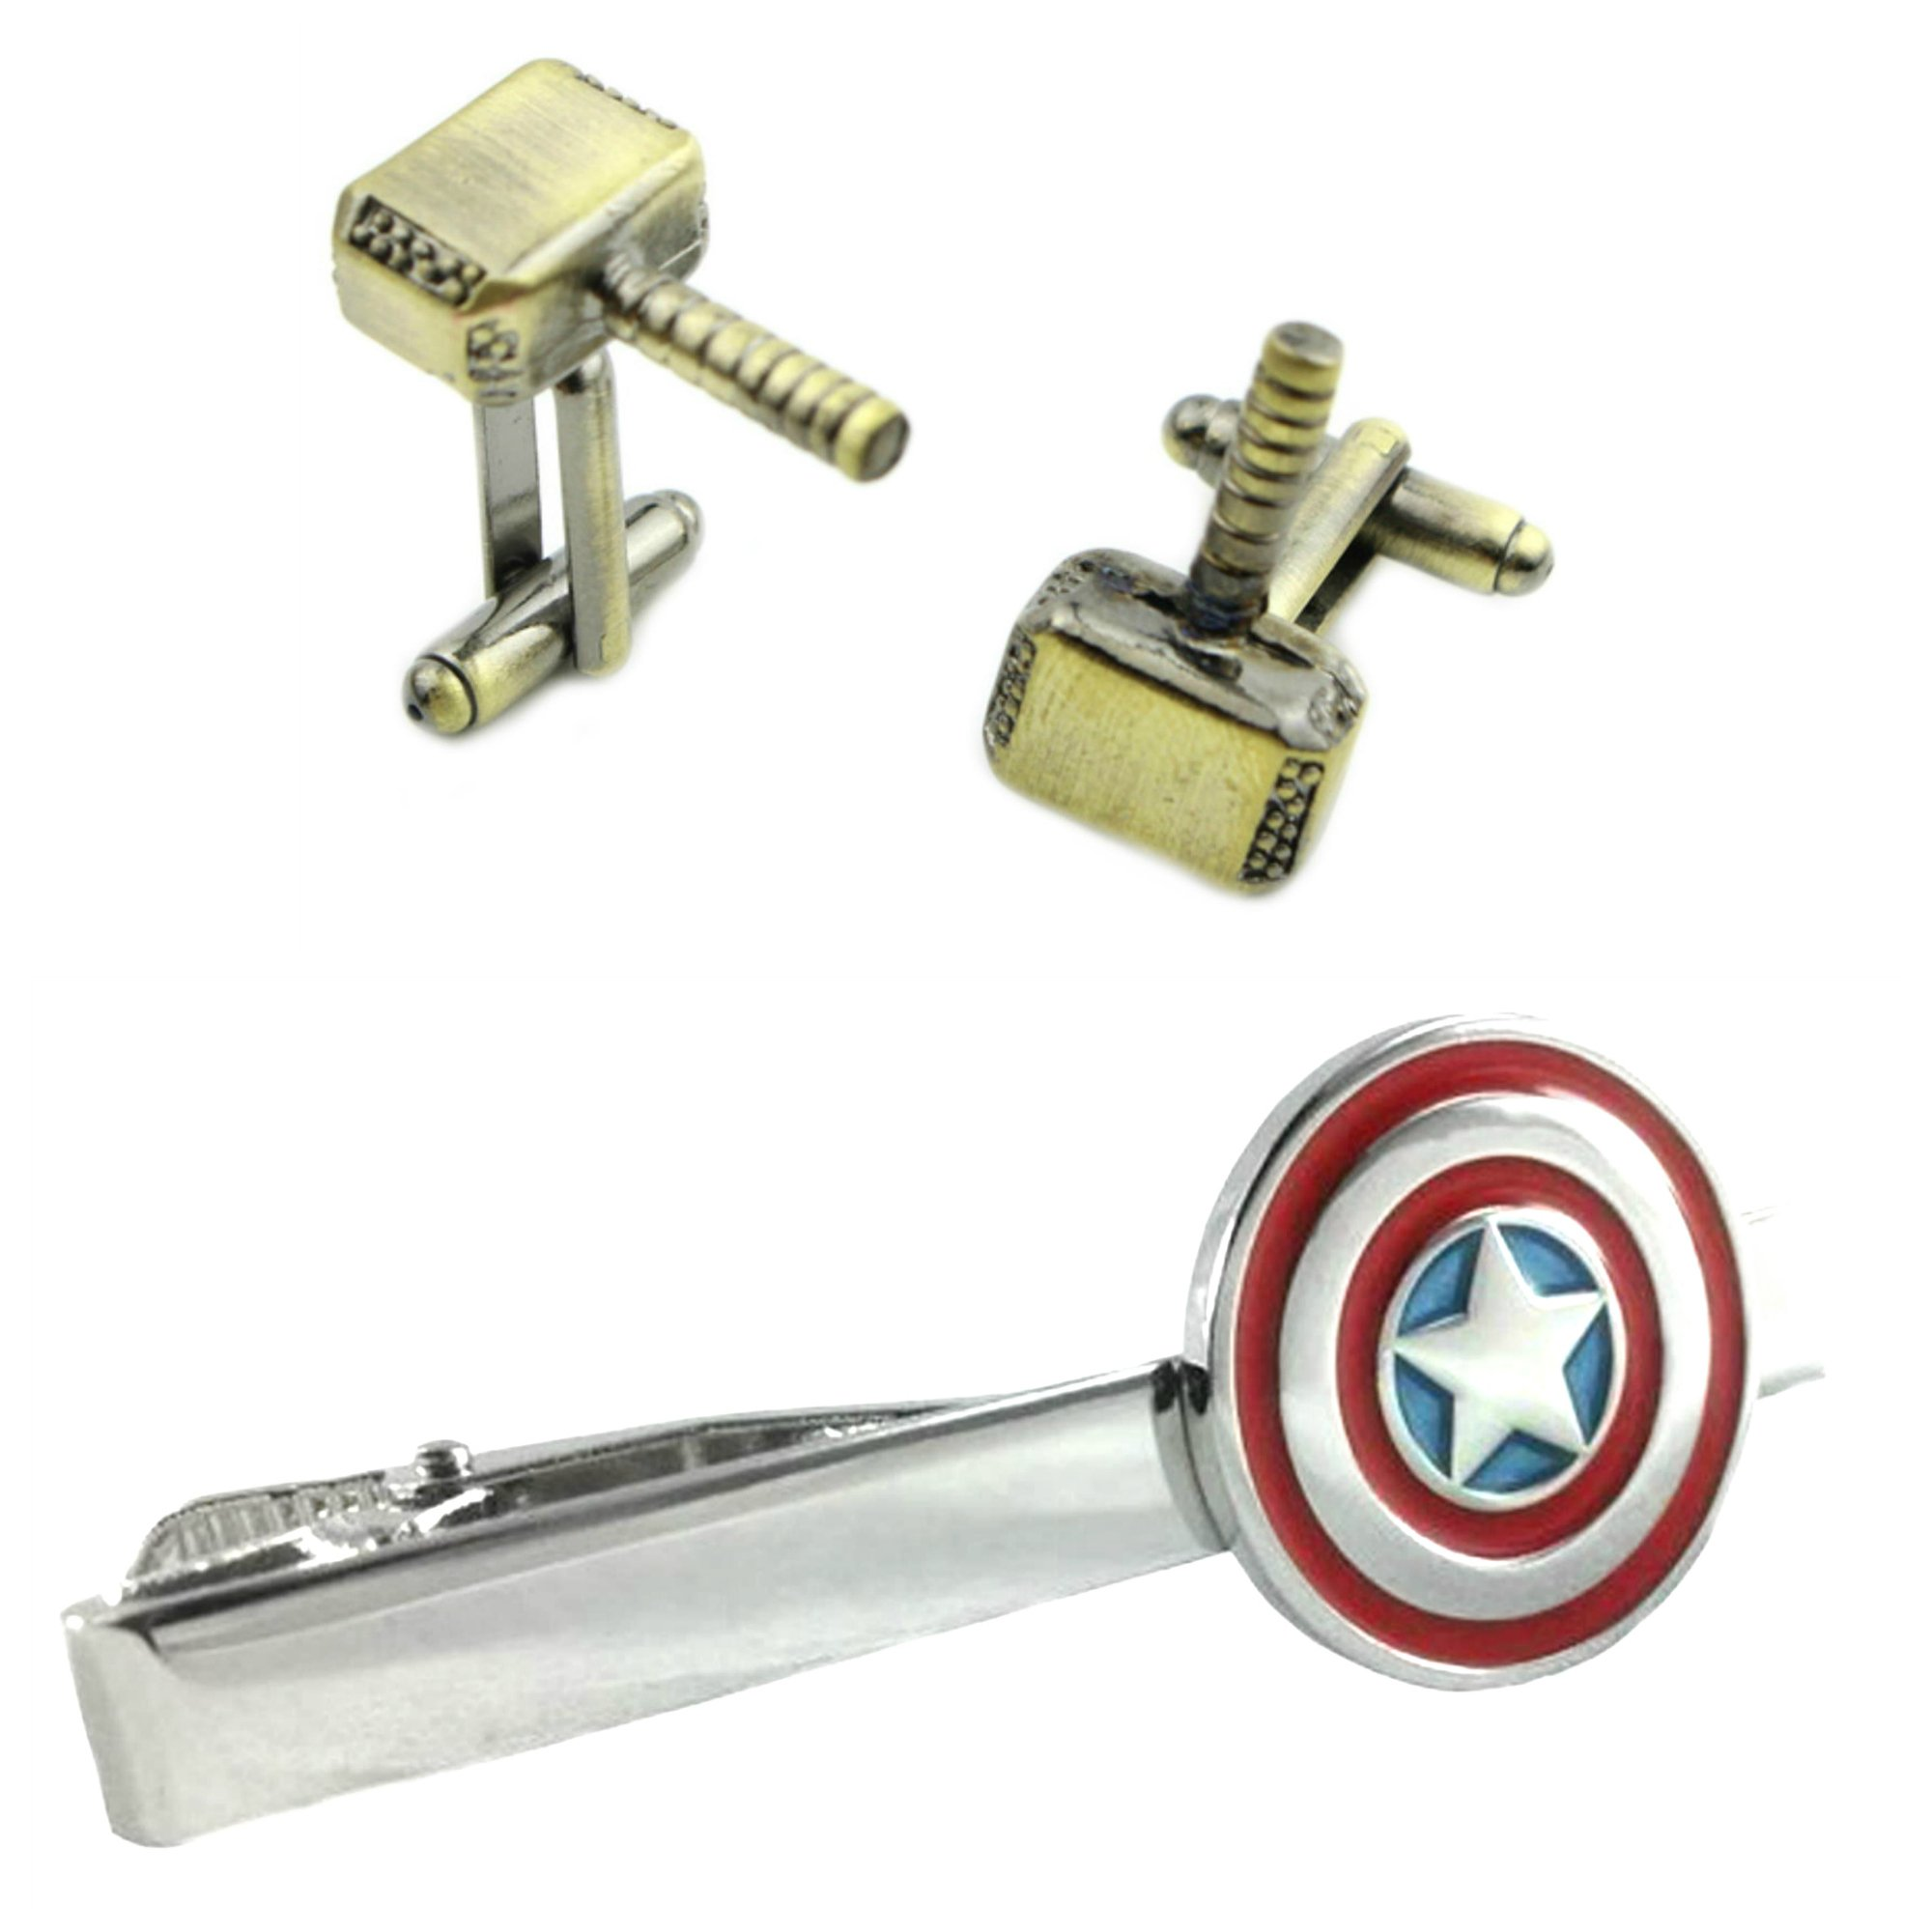 Outlander Thor Bronze Cufflink & Captain America Tiebar - New 2018 Marvel Studios Superhero Movies - Set of 2 Wedding Logo w/Gift Box